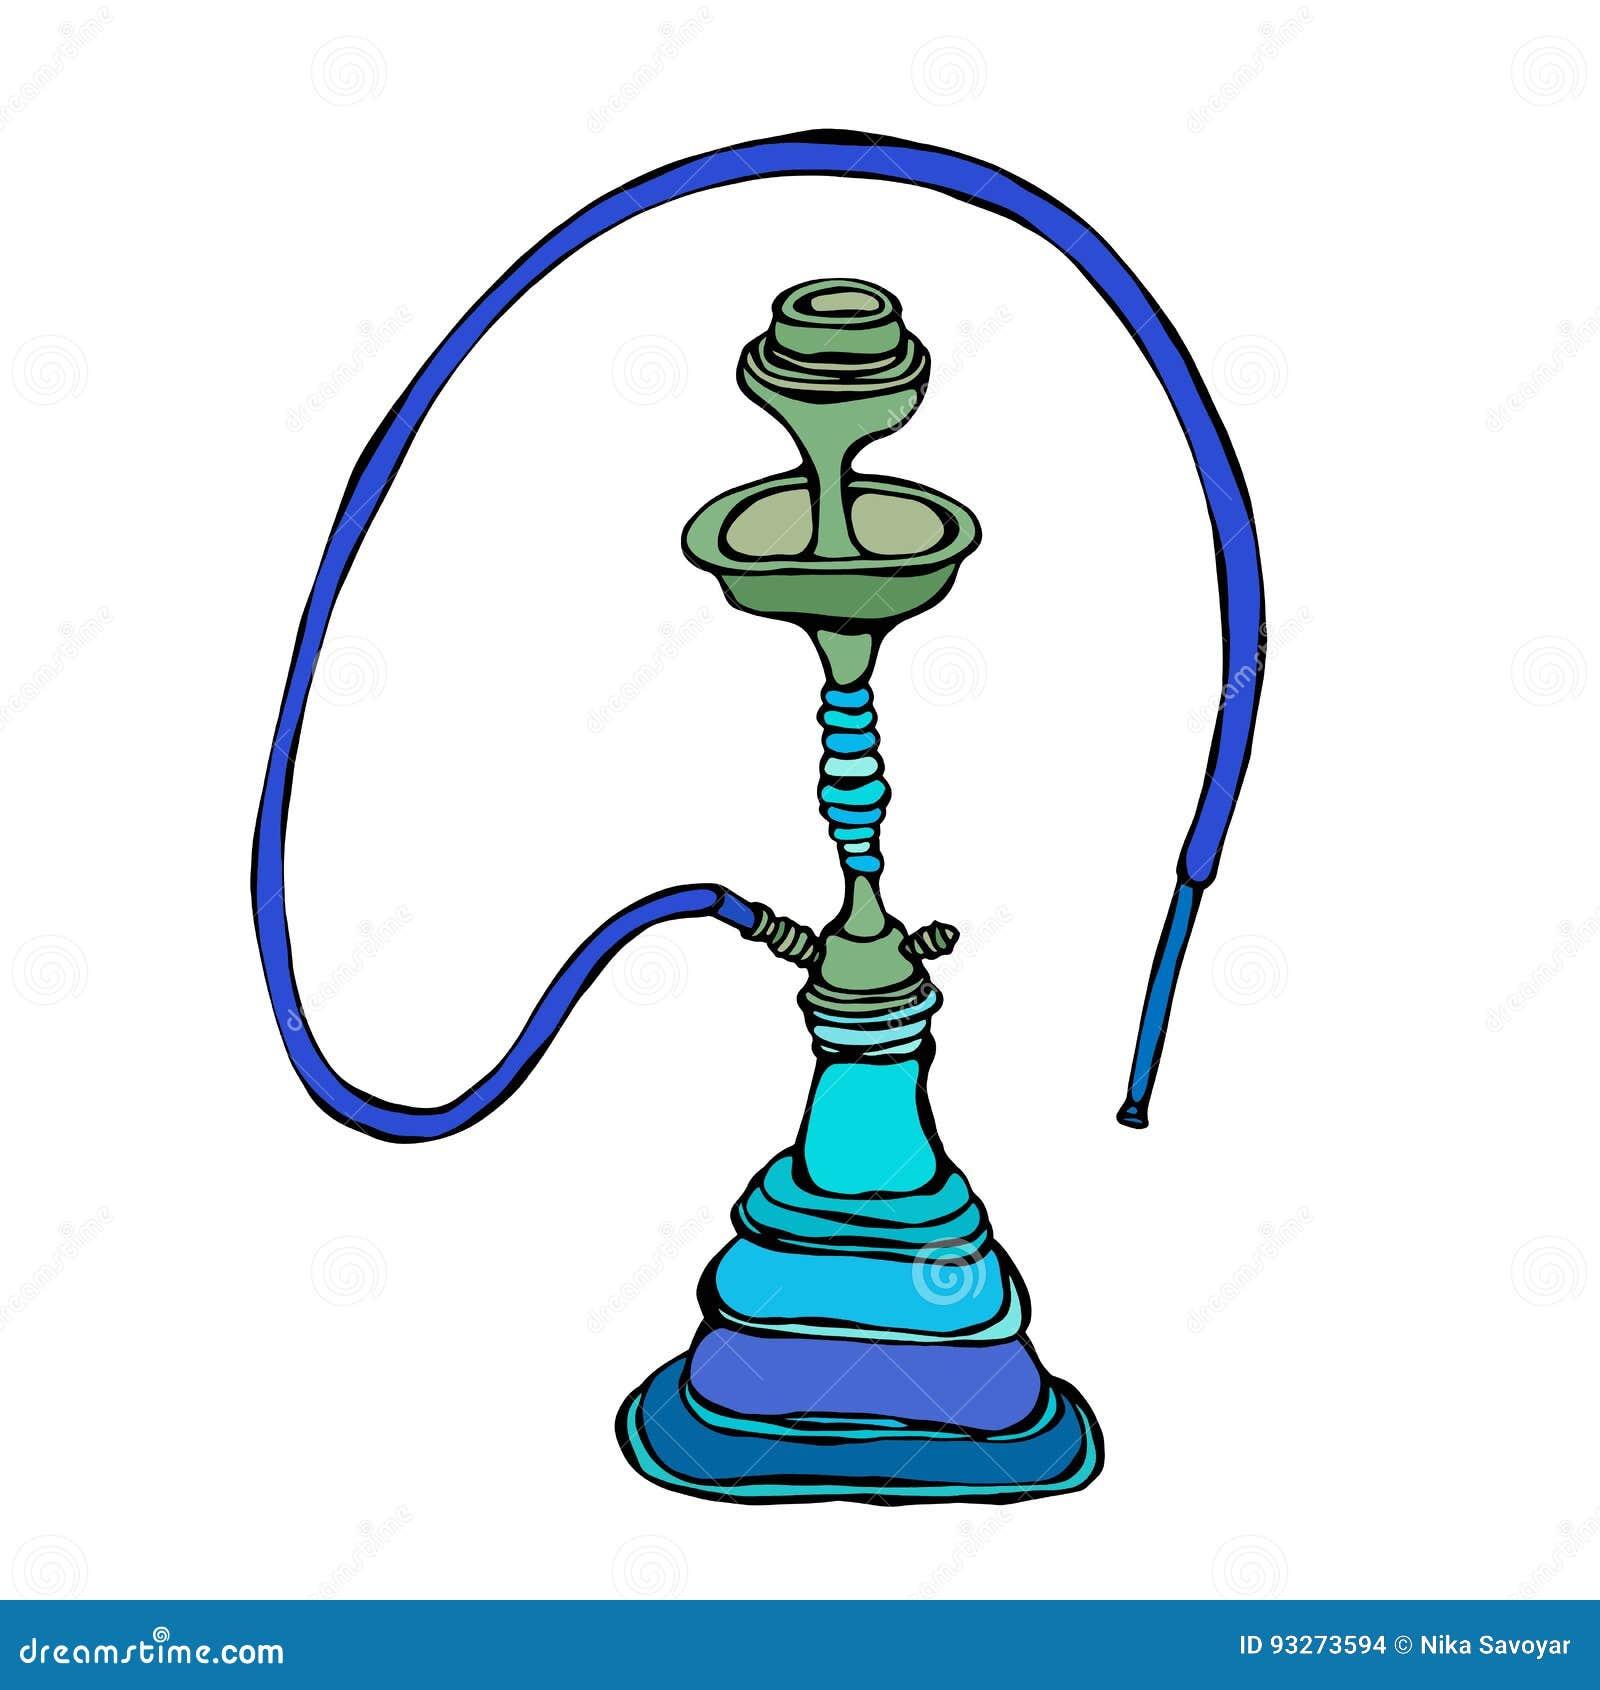 shisha  bong  hooka  hookah with smoking pipe  oriental hookah vector free hookah vector eps